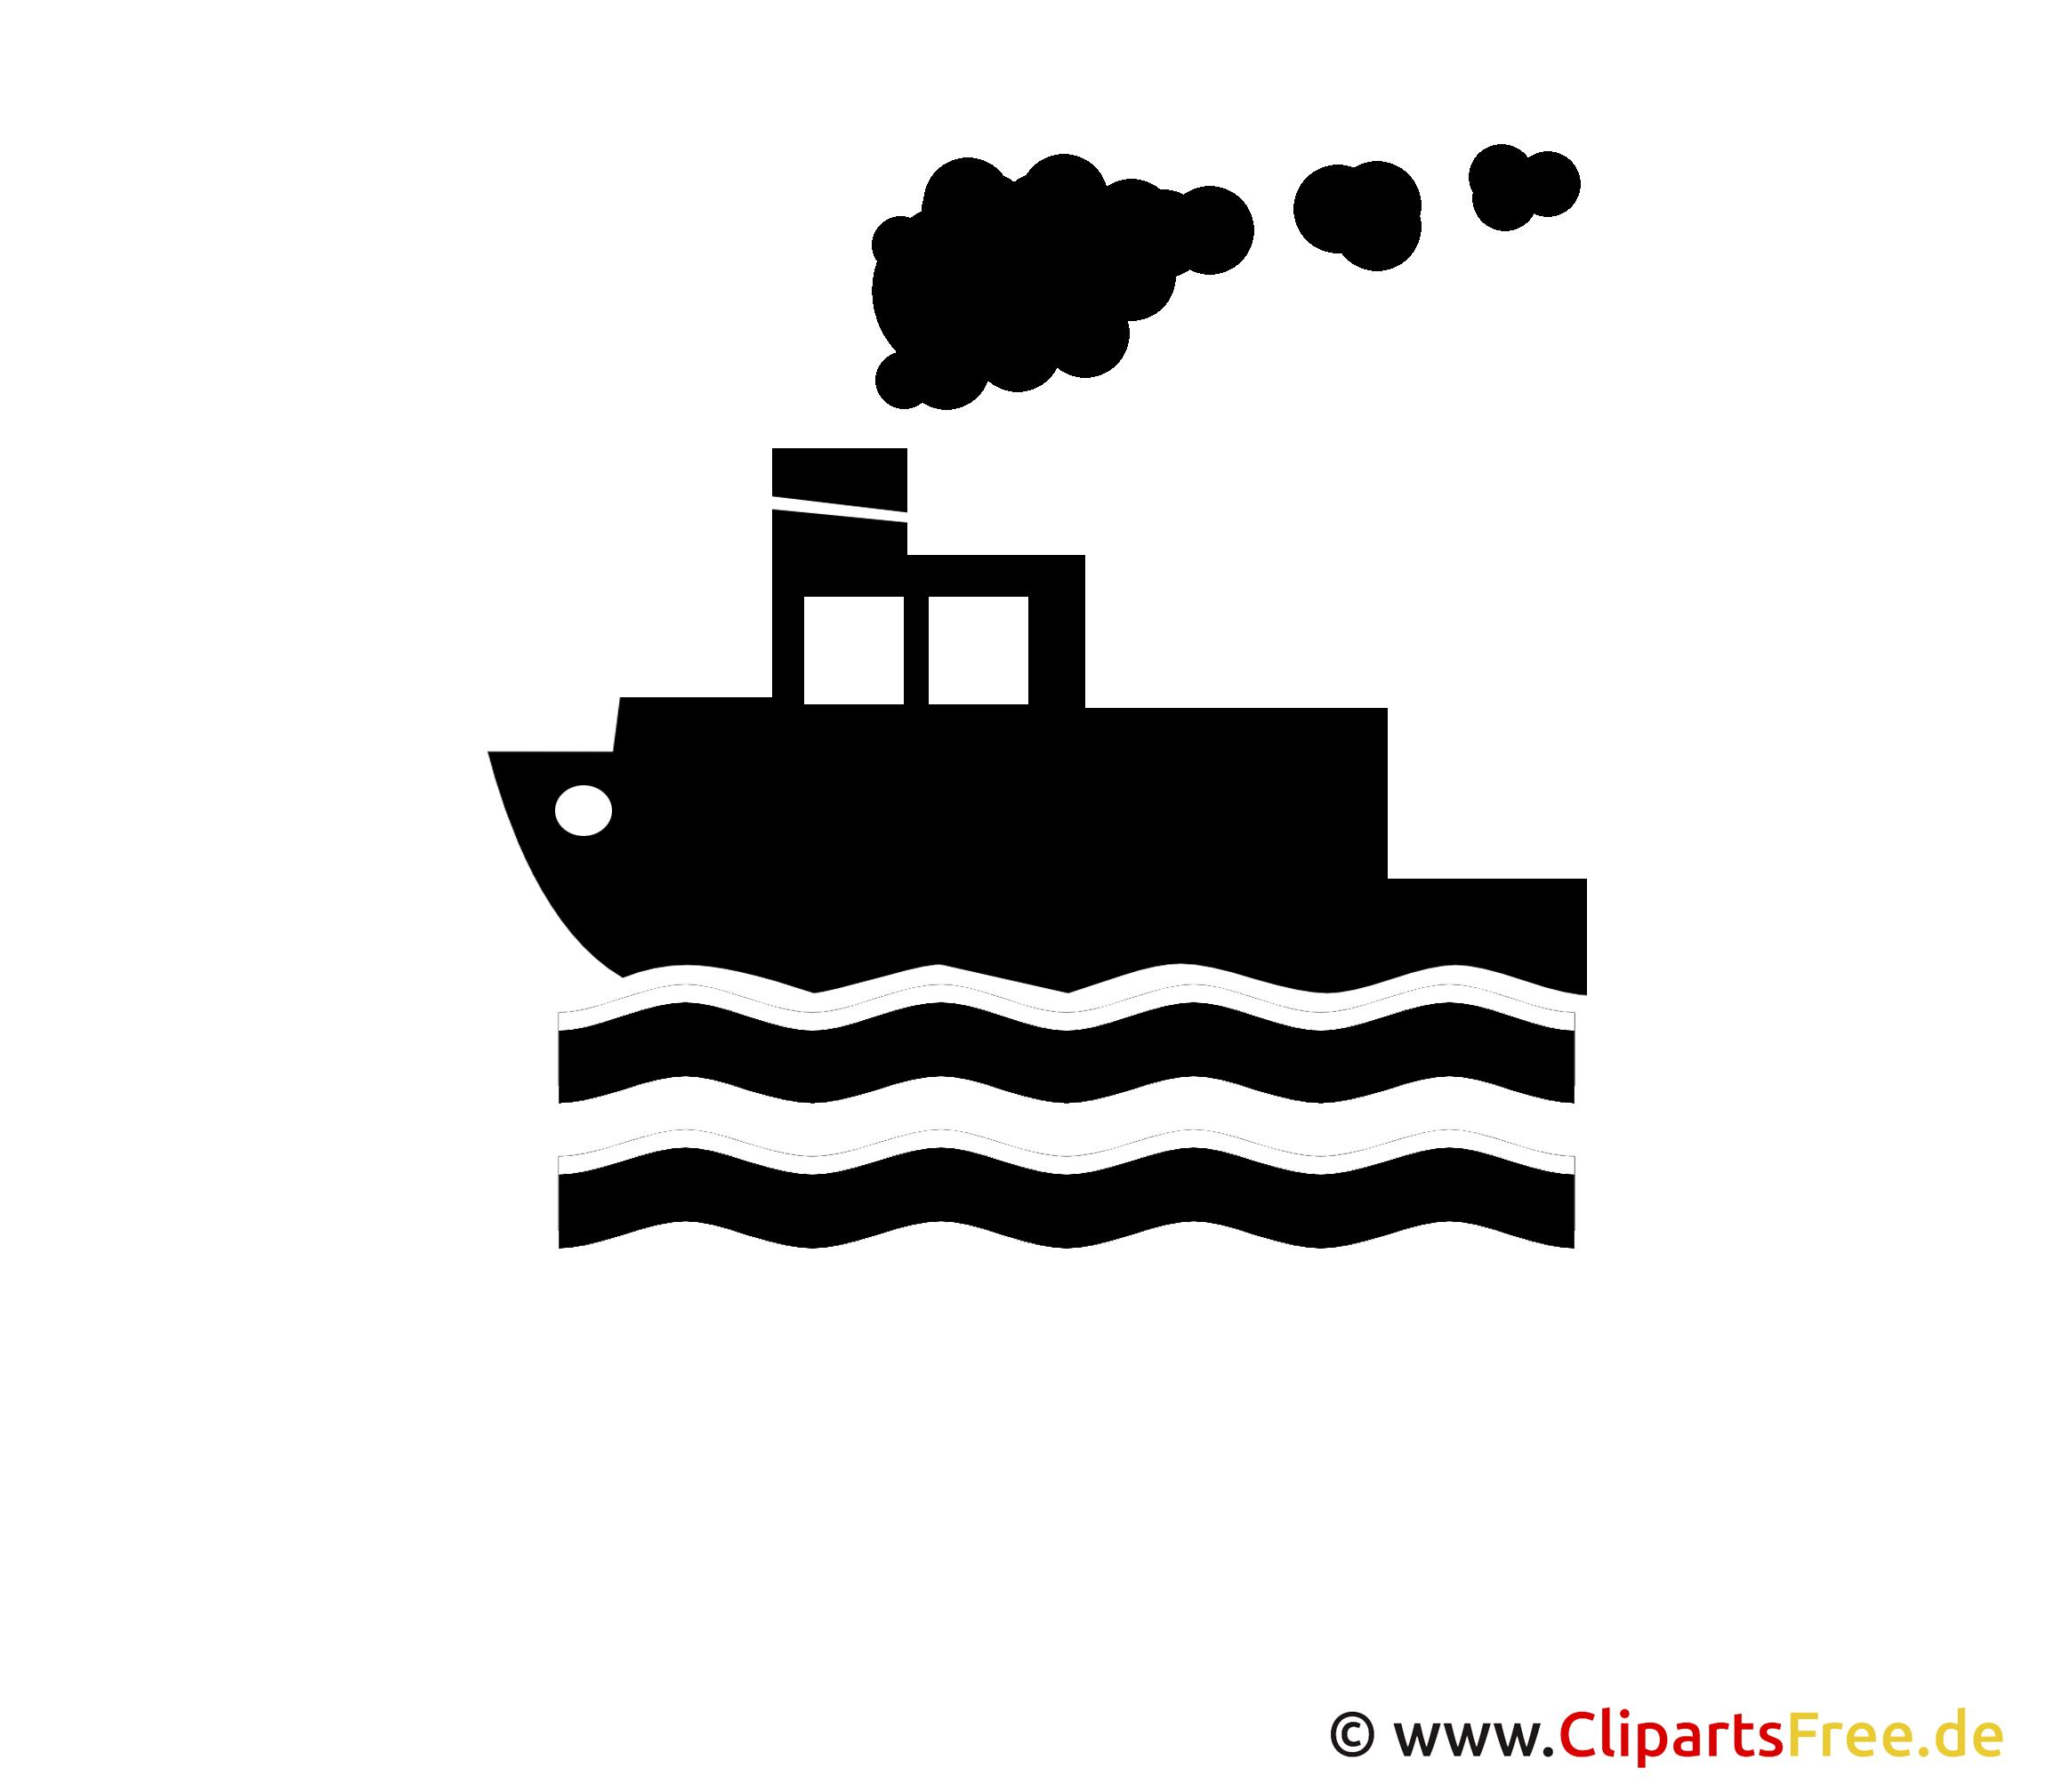 Schiff SiIhouette